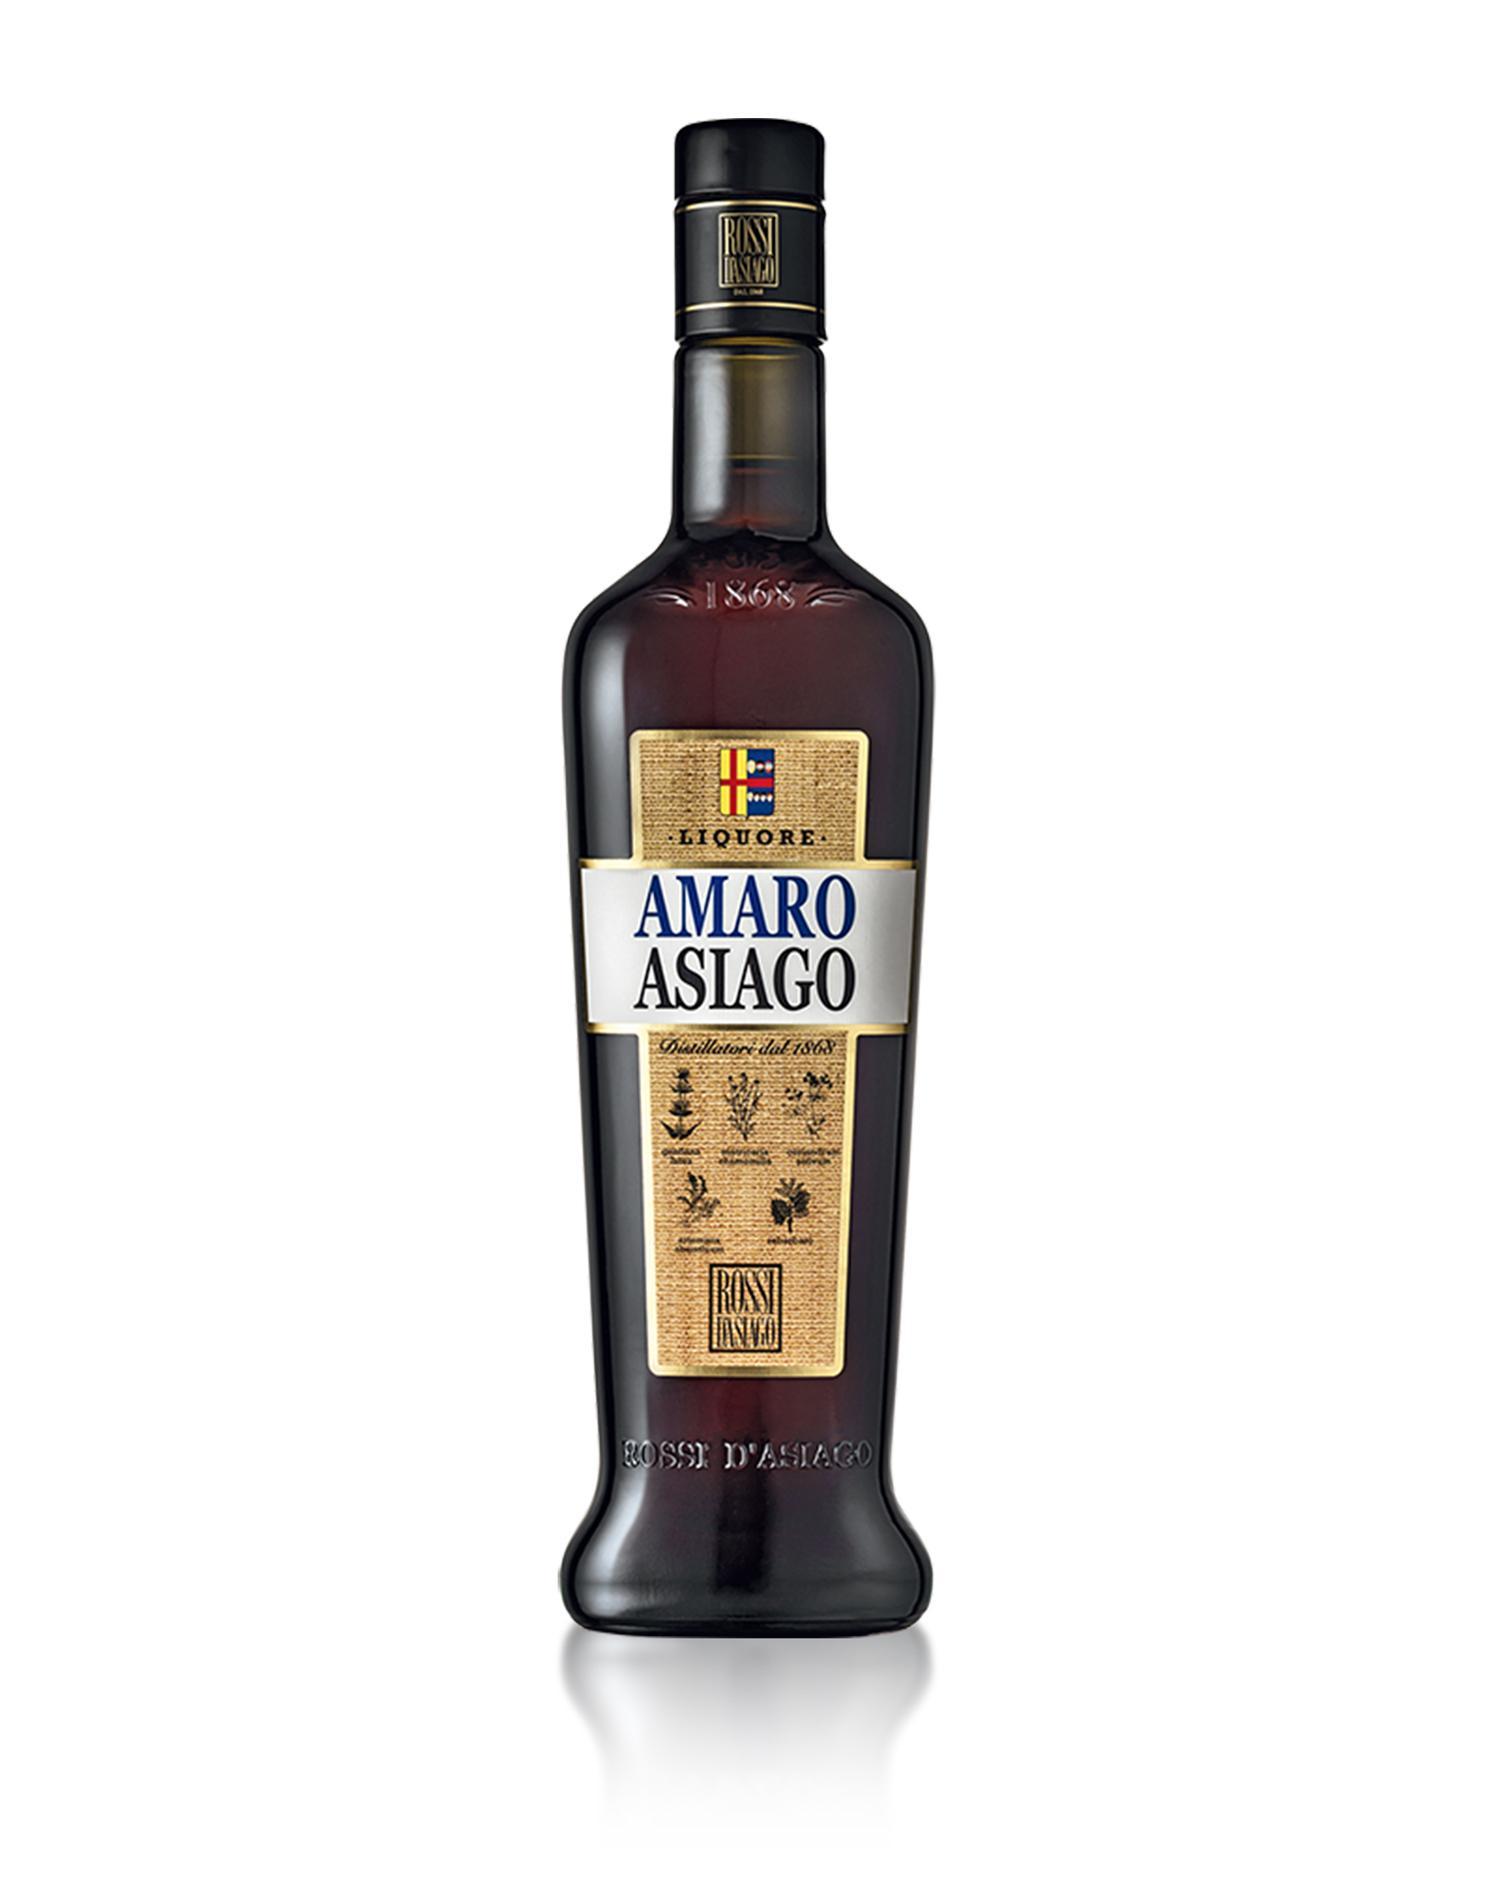 Amaro Asiago